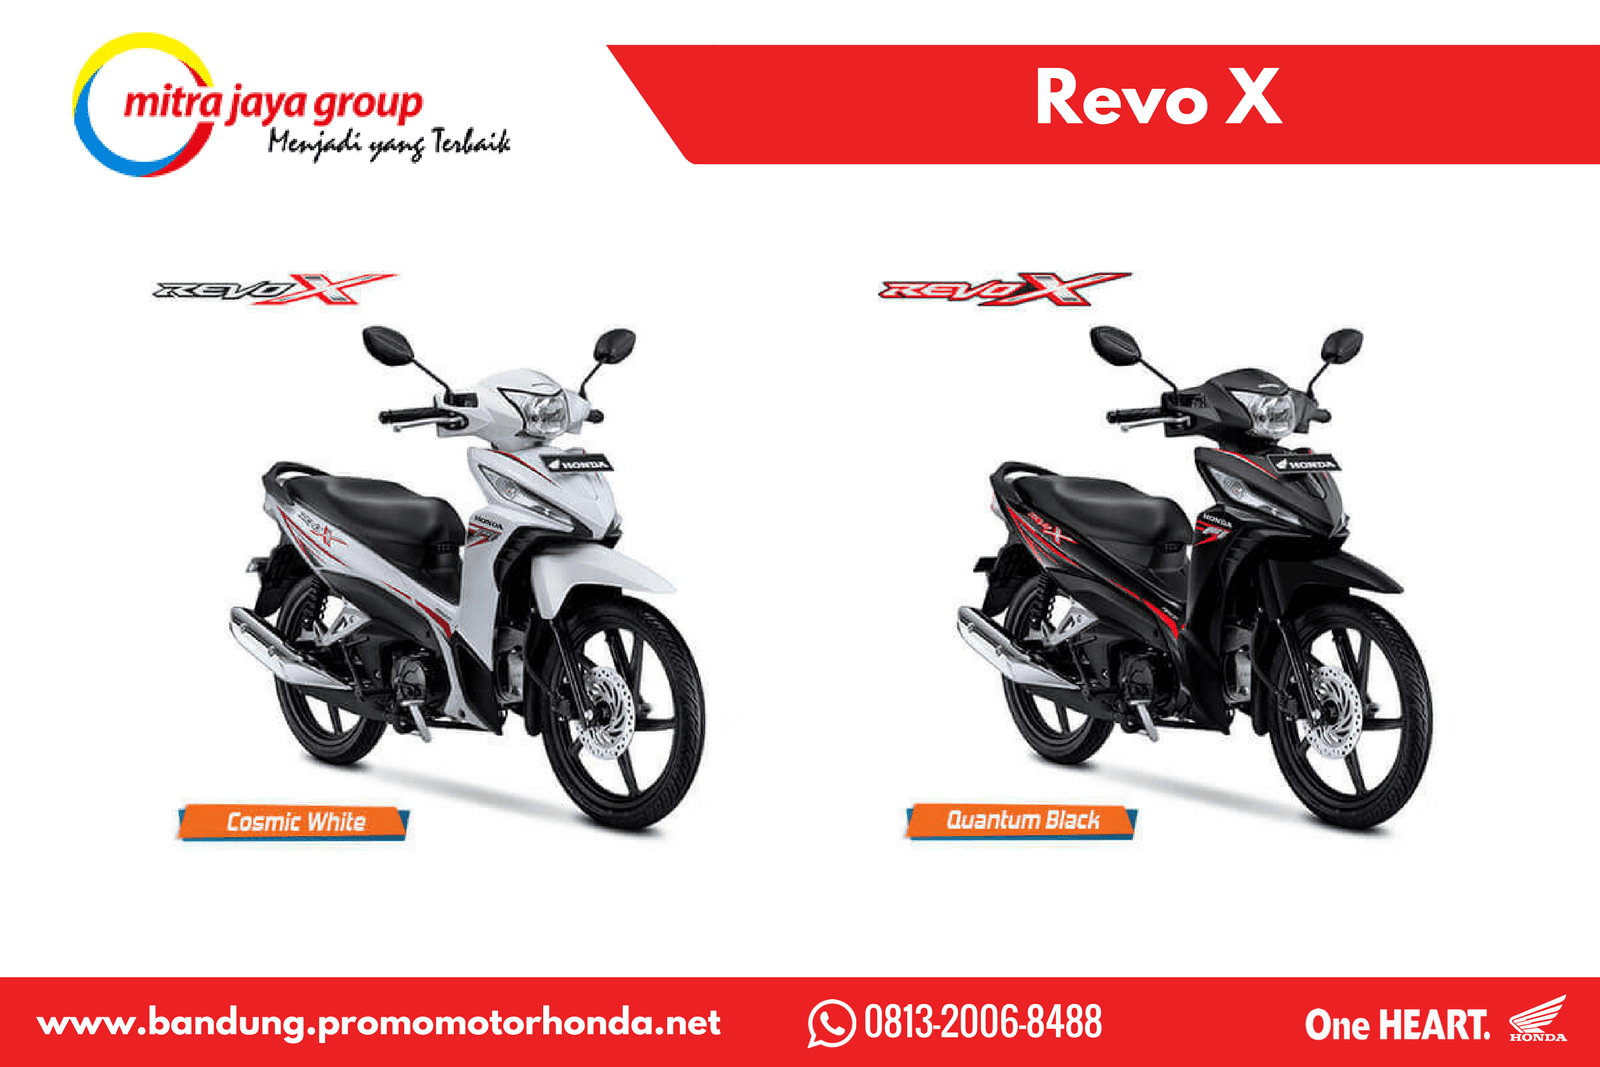 Foto Motor Revo Fit 2018 Neo Green Kota Semarang Harga Kredit Honda X Dan Wilayah Bandung Terbaru